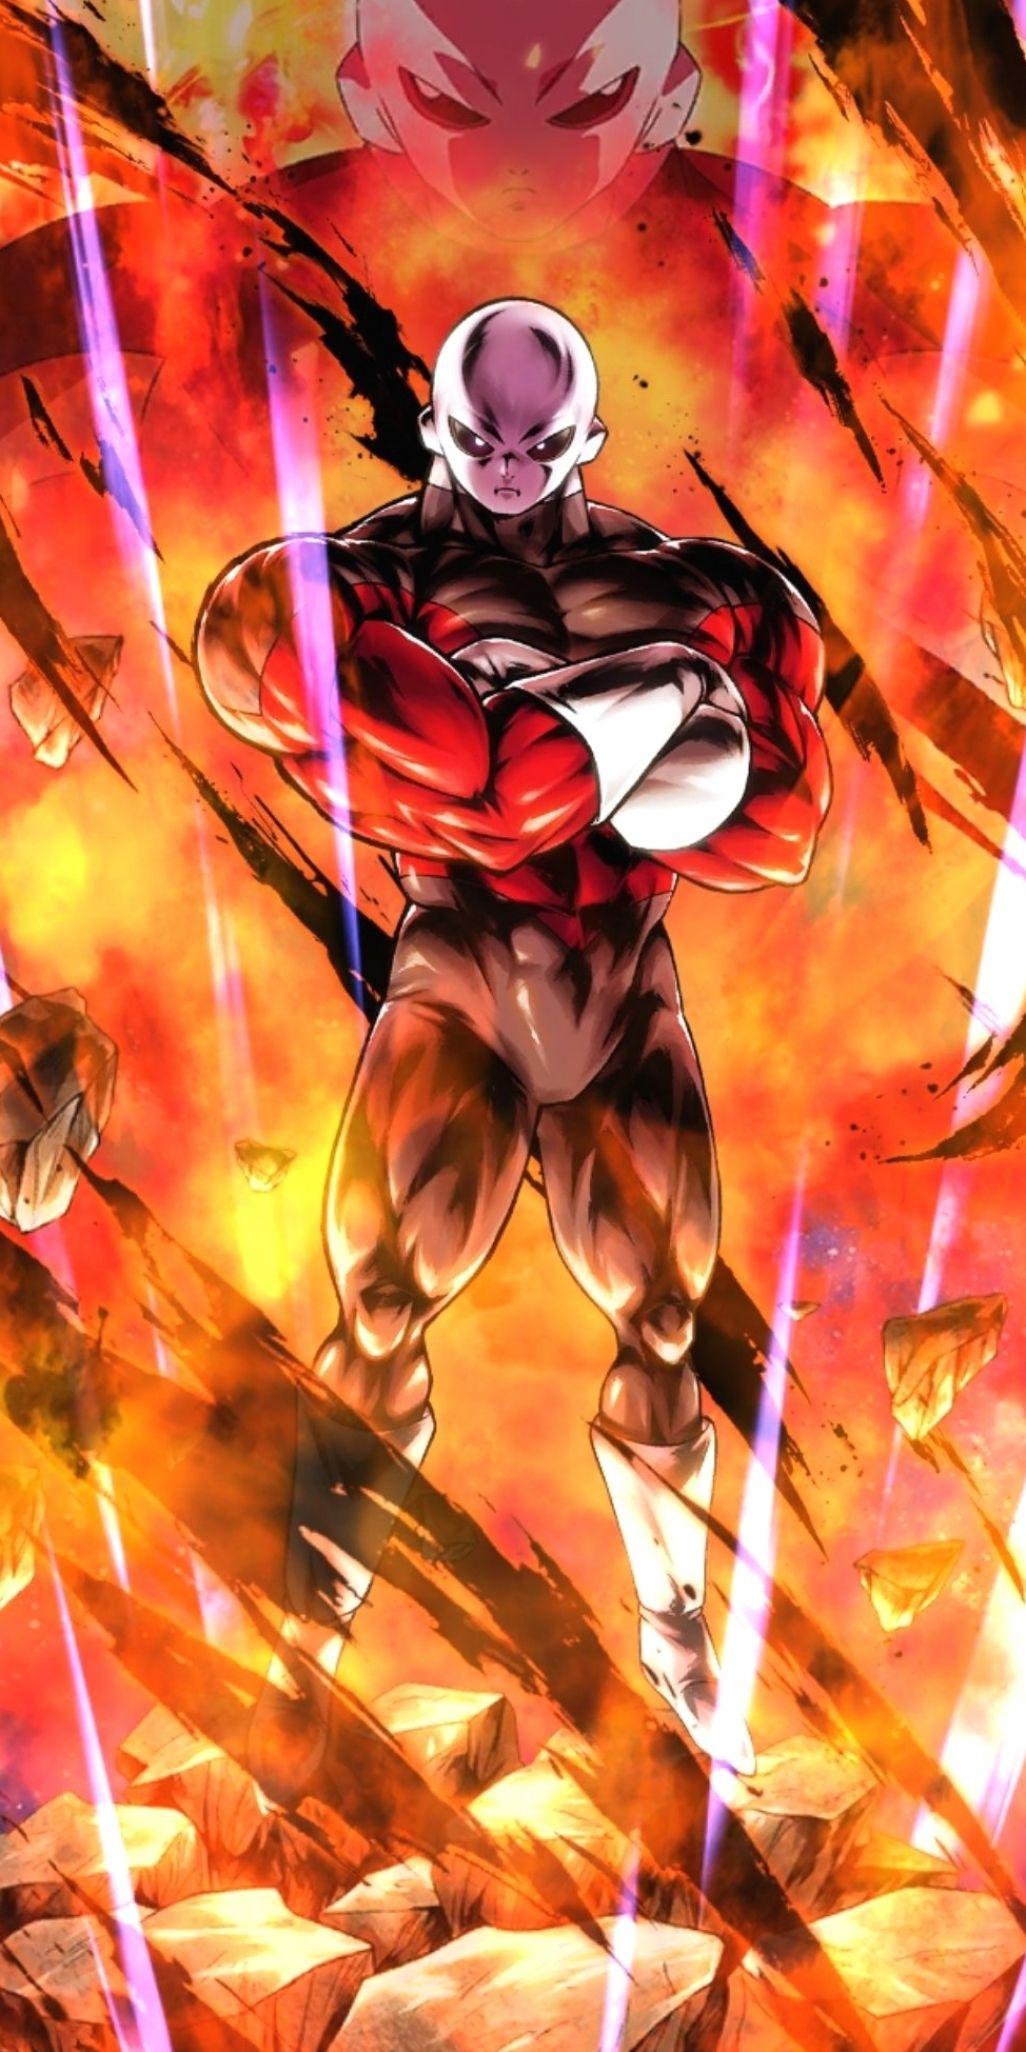 Jiren Dragon Ball Legends In 2021 Dragon Ball Art Goku Dragon Ball Super Artwork Dragon Ball Artwork